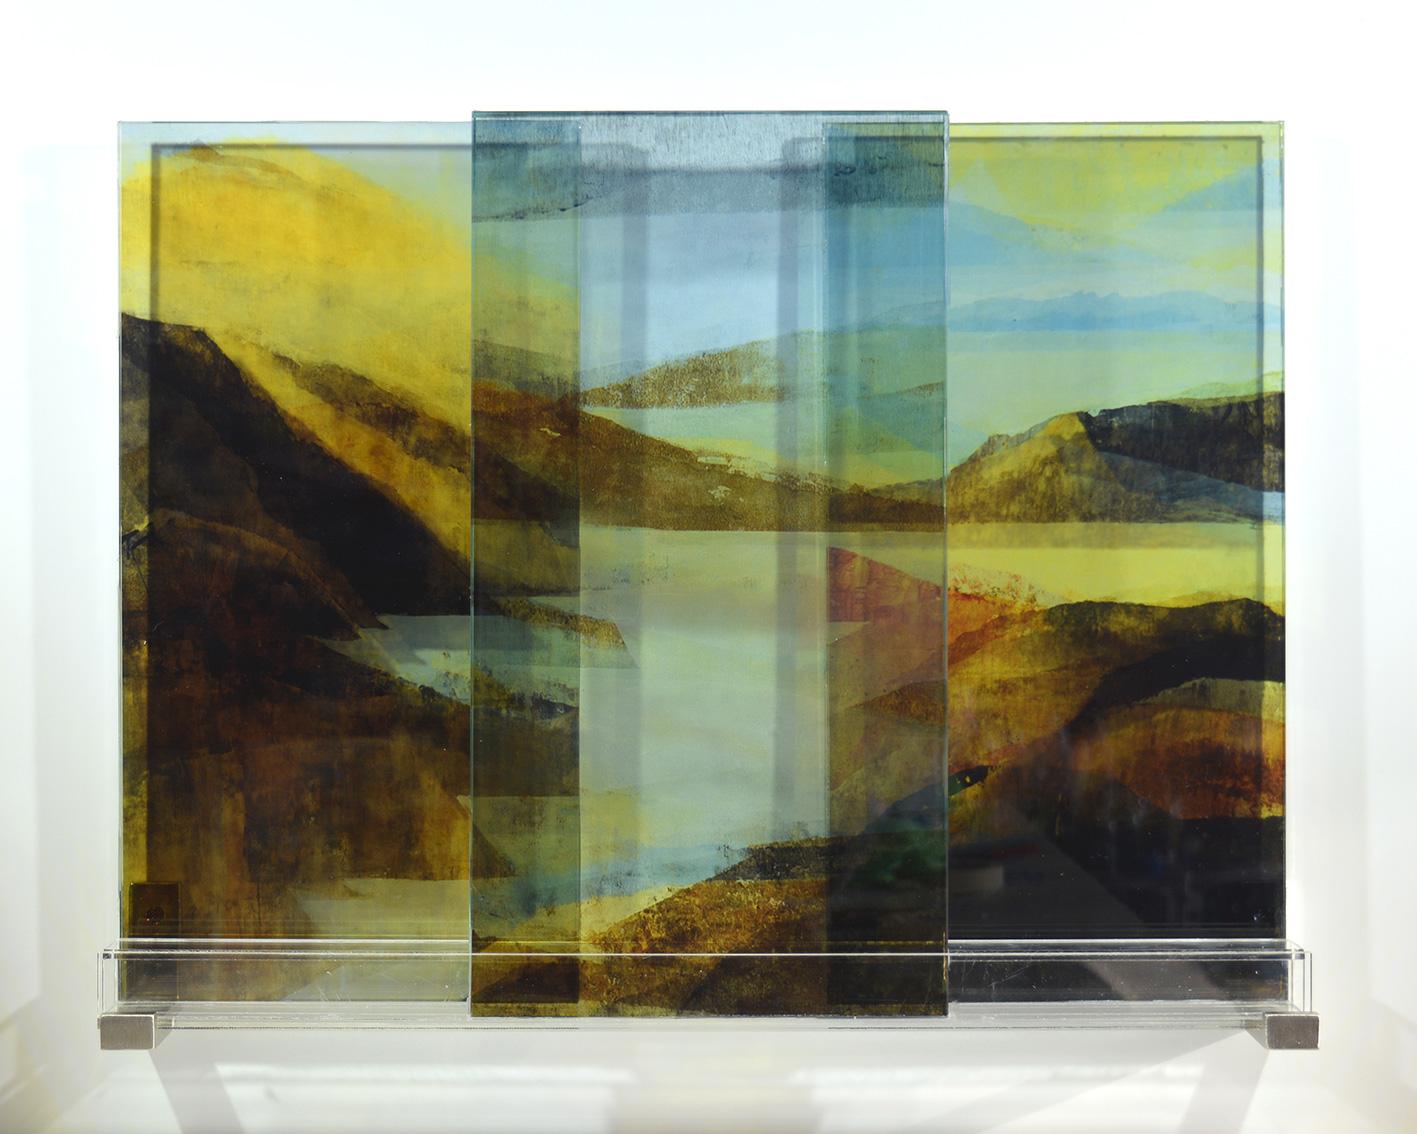 Glass-land-slide-triptych-IV-2018--kiln-fired-laminated-glass-3x-42-x-22cm-total-size-42-x-56cm.jpg